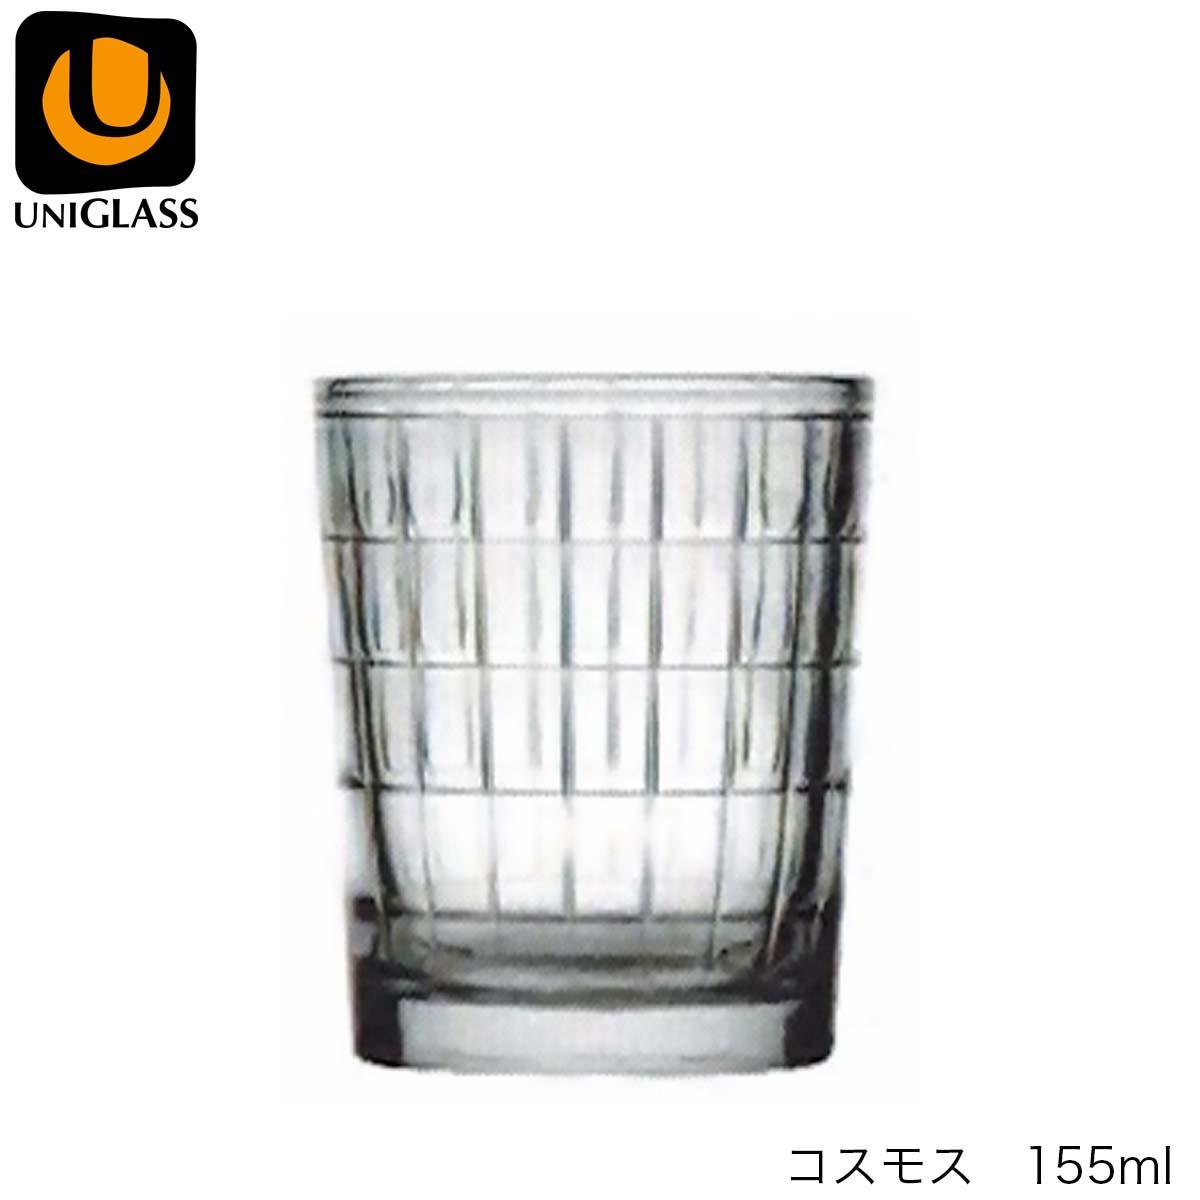 UNIGLASS ユニグラス コスモス 155ml 48個セット YIOULA Glassworks ブルガリア製